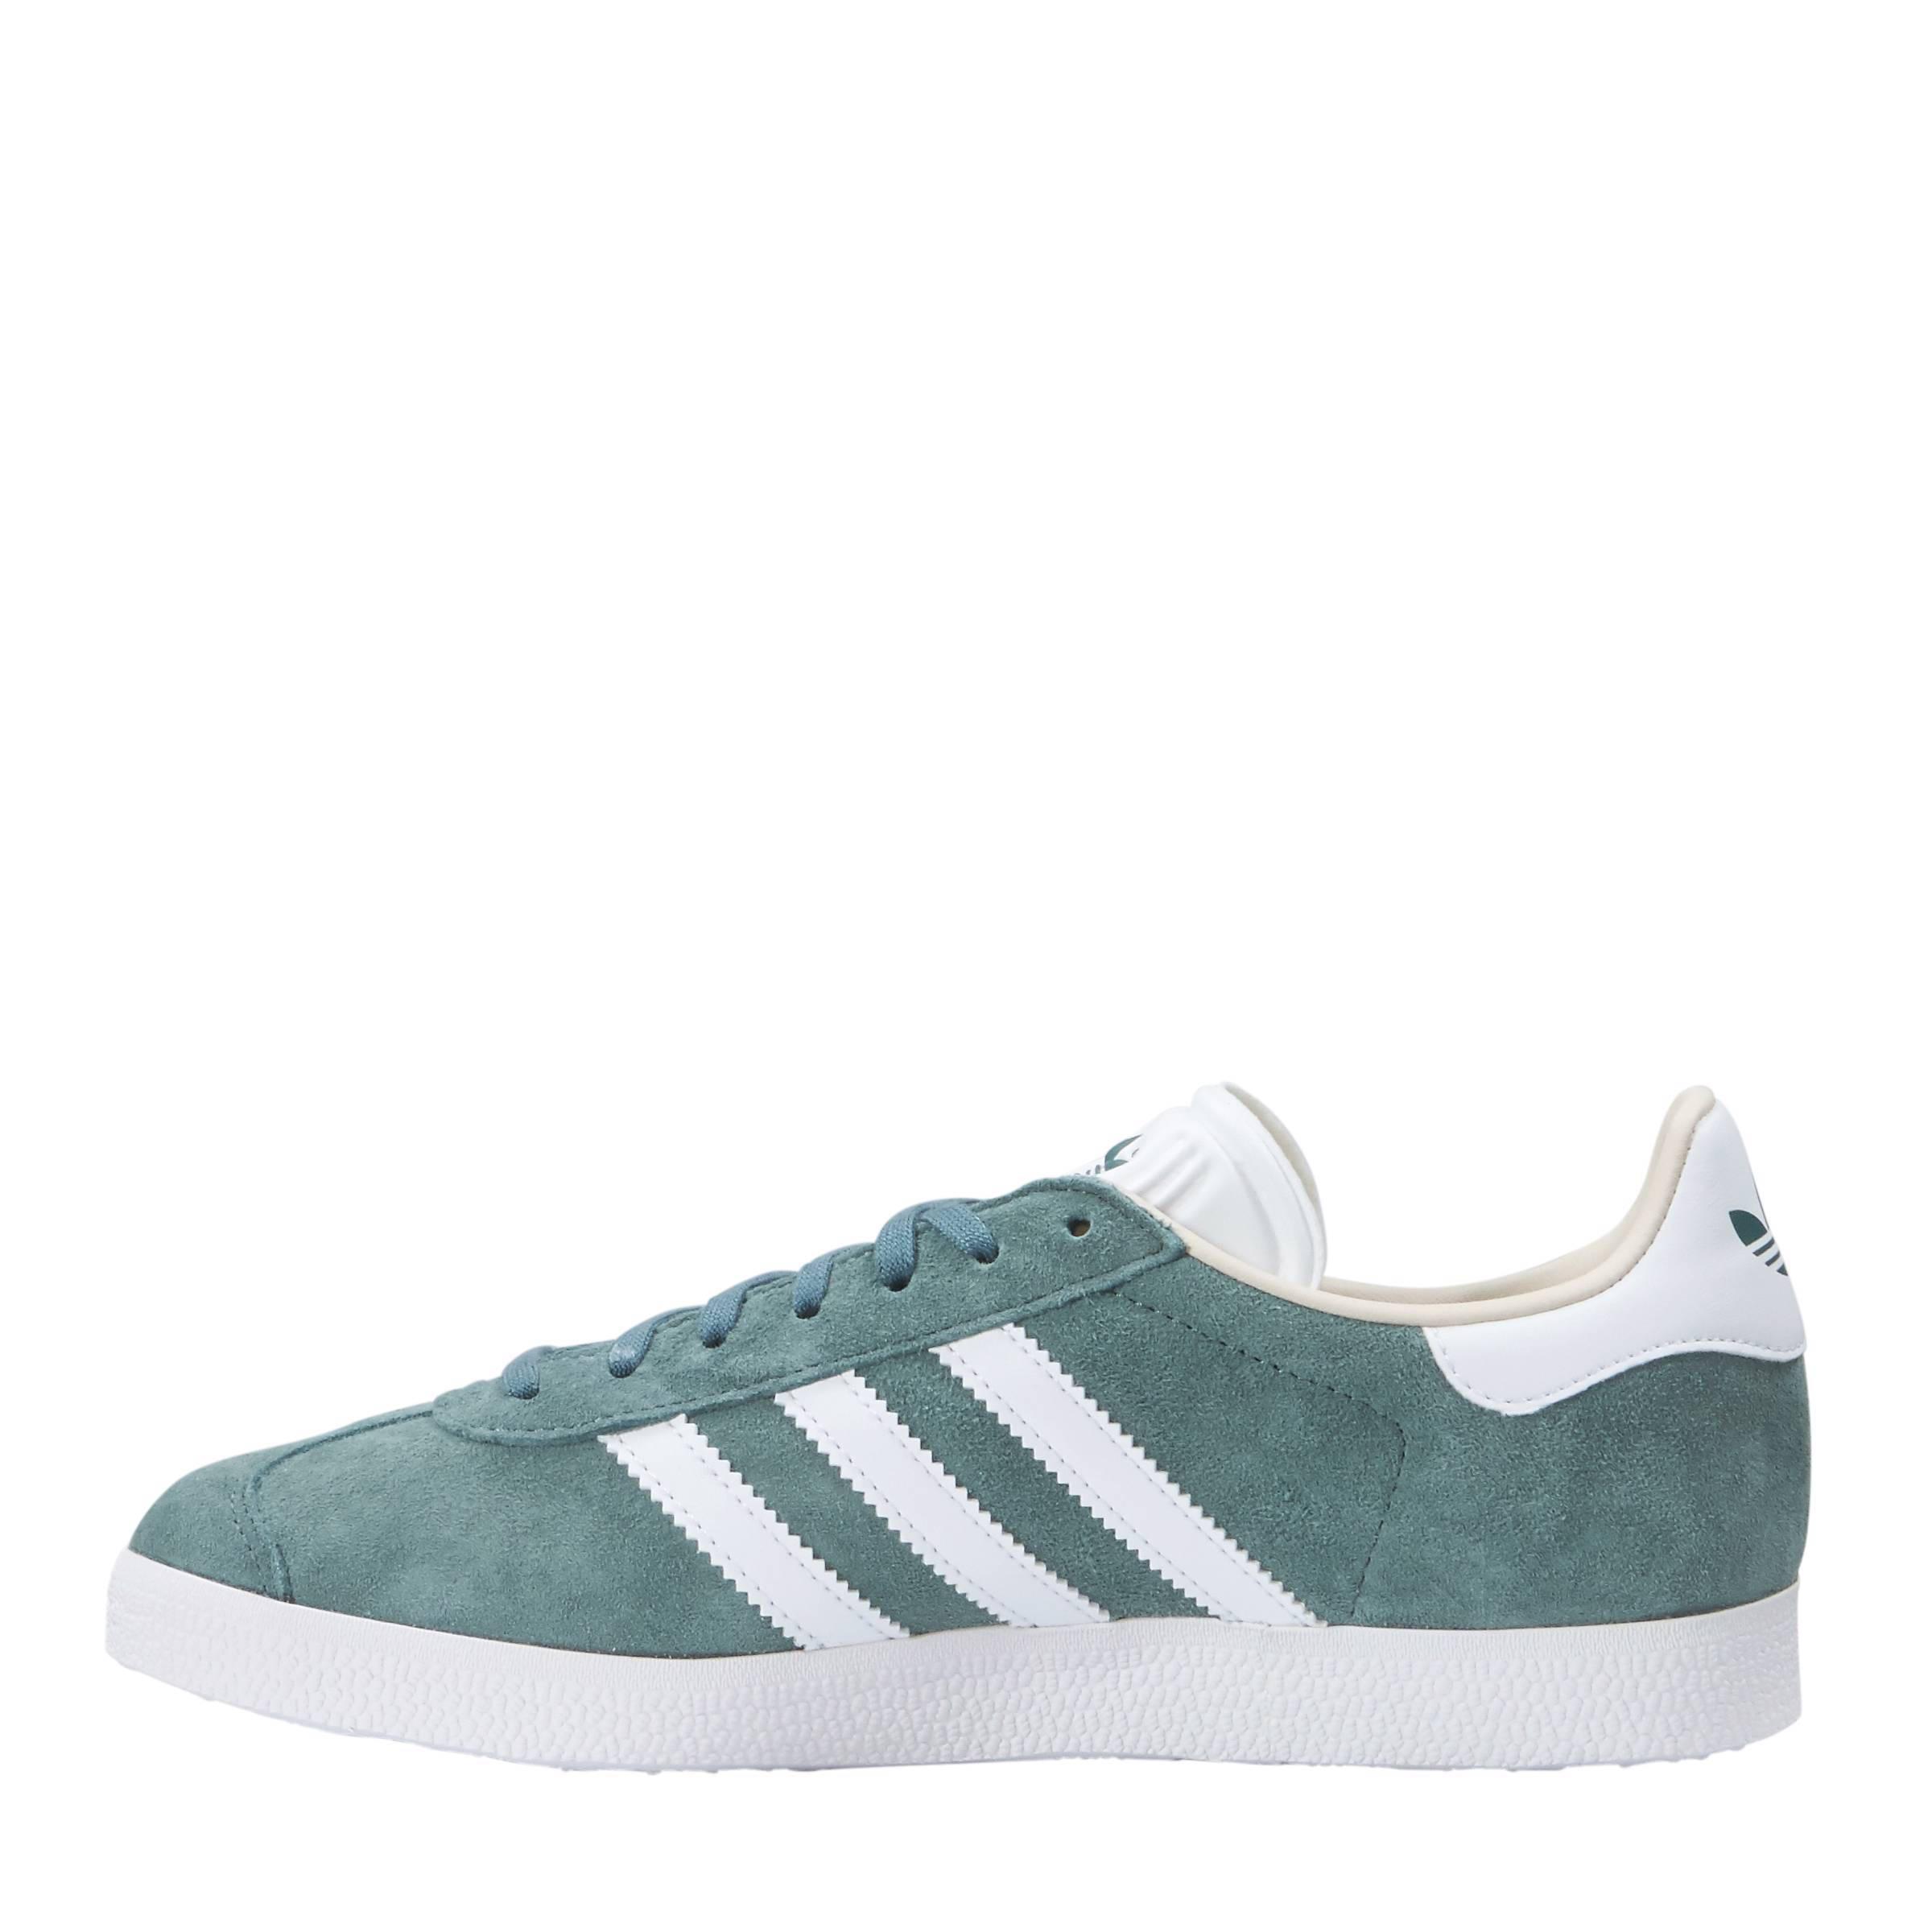 617a7ea3d24 adidas originals Gazelle sneakers groen | wehkamp